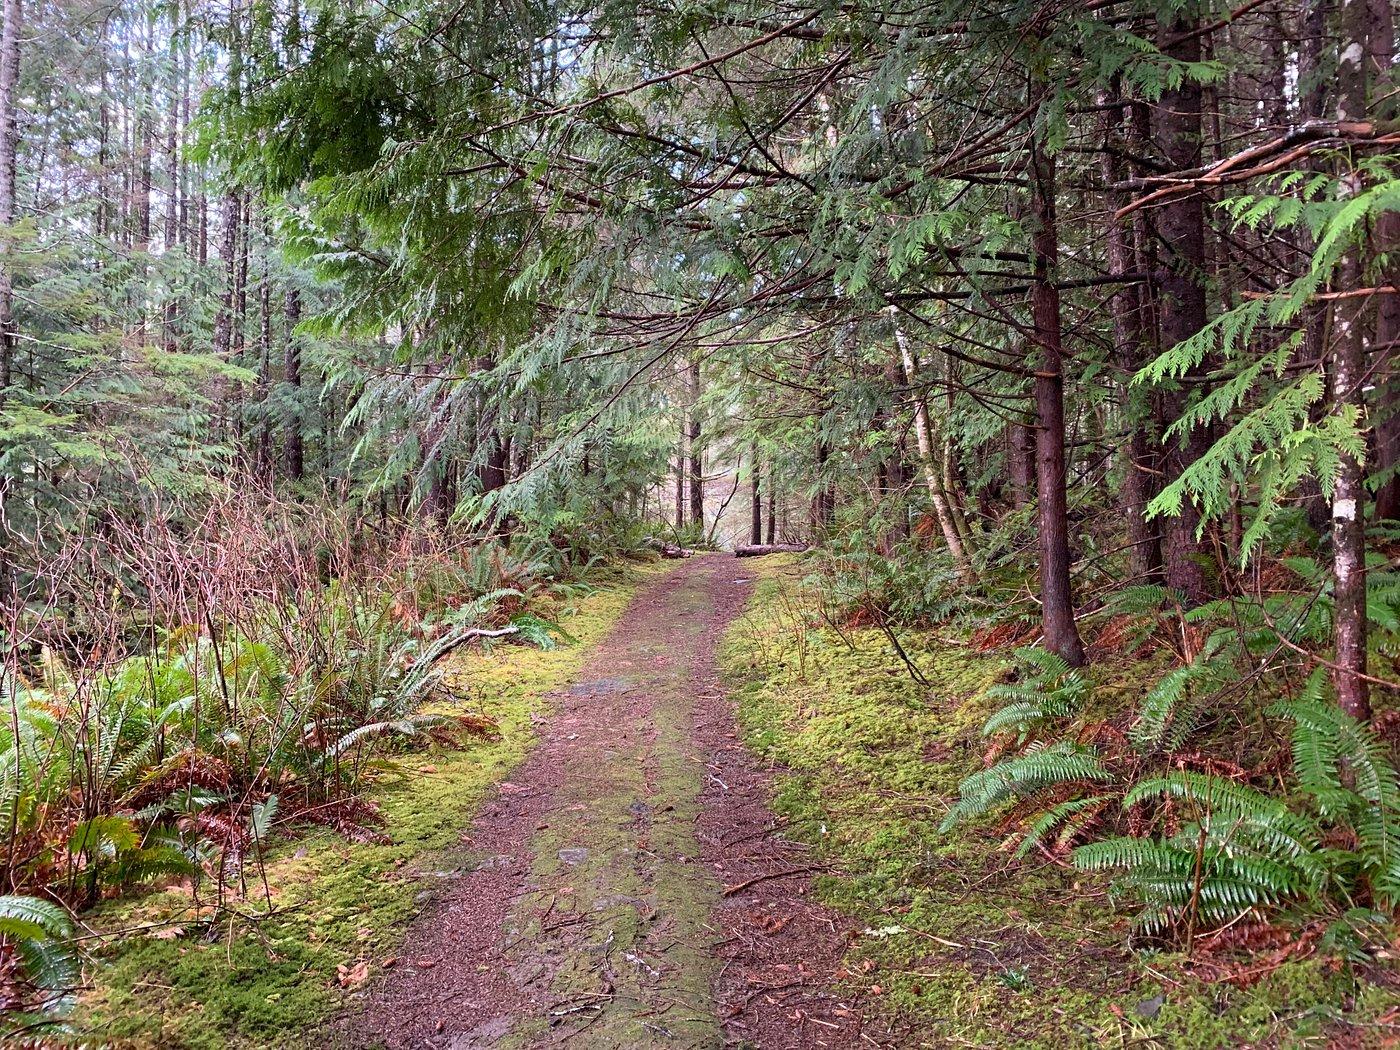 tarundl-skid-road